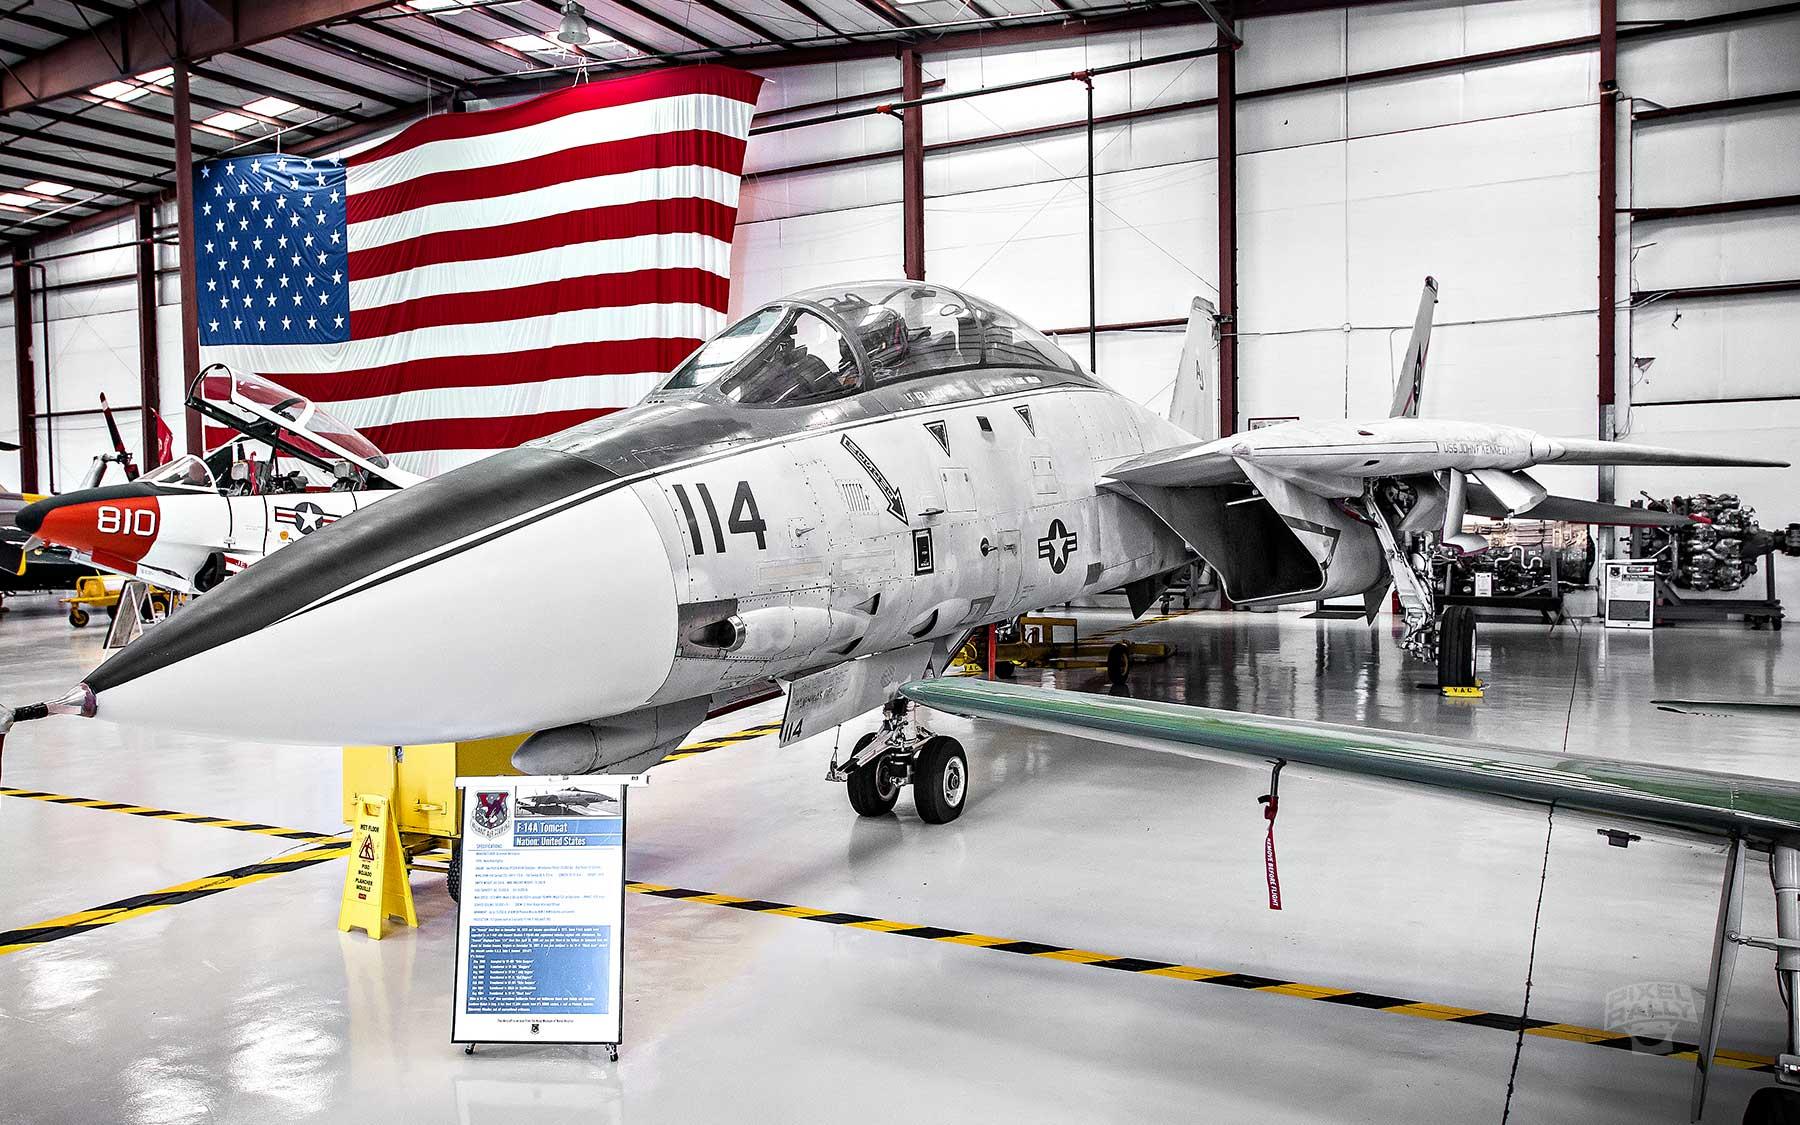 FL-WarbirdsMuseum-F14A-tomcat-angle